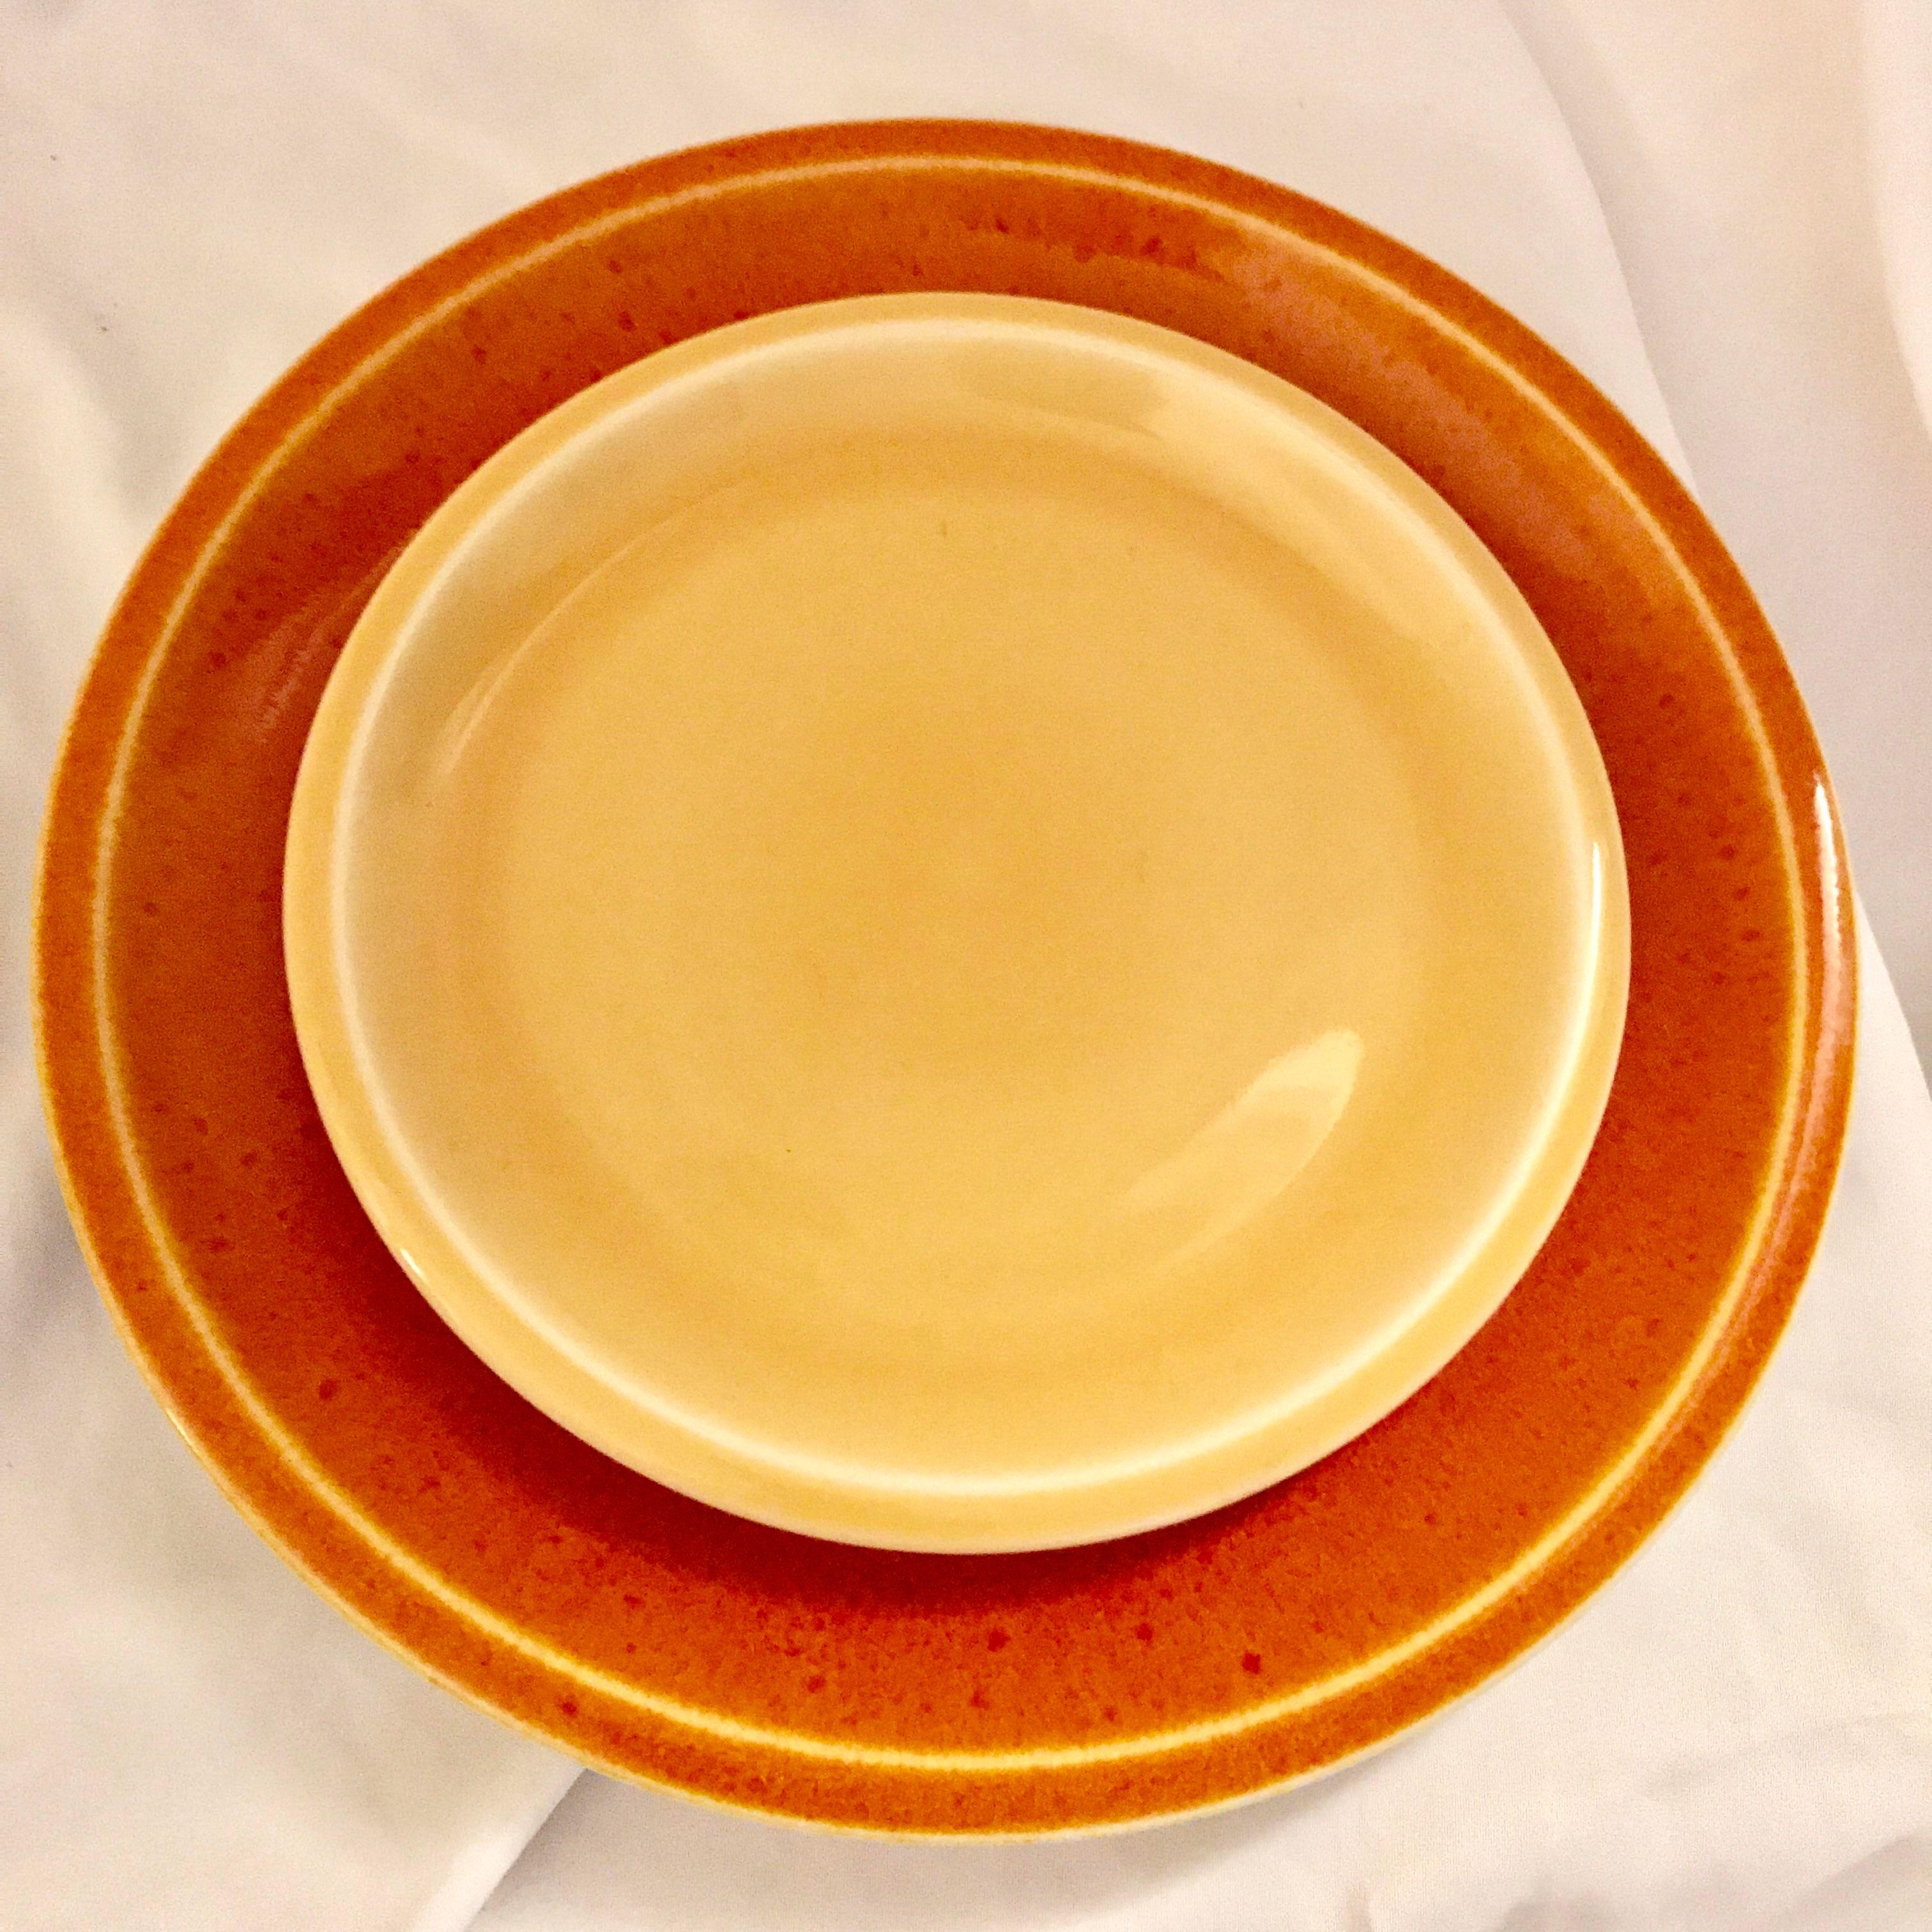 Jars of France Orange Dinner Plates u0026 Yellow Salad Plates - 8 Pieces - Image 2 & Jars of France Orange Dinner Plates u0026 Yellow Salad Plates - 8 Pieces ...